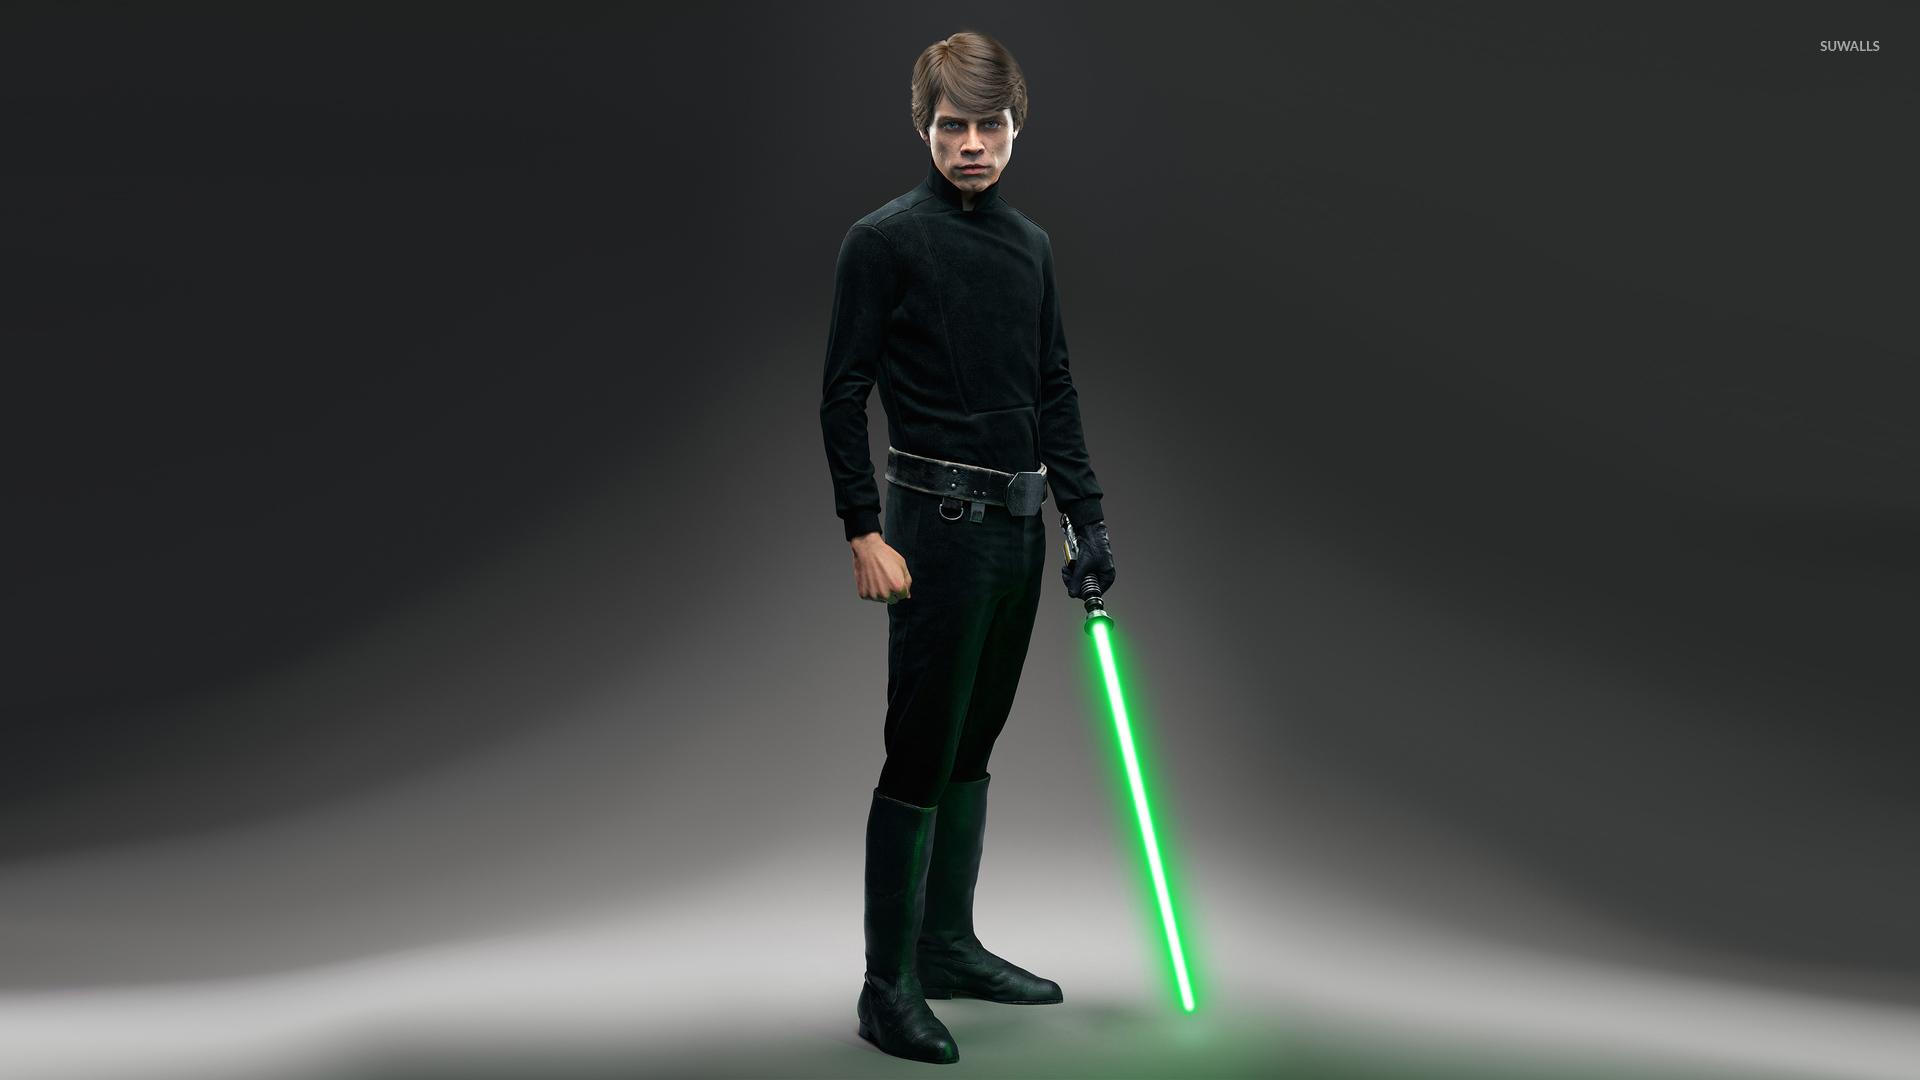 Luke Skywalker - Star Wars Battlefront wallpaper - Game ...